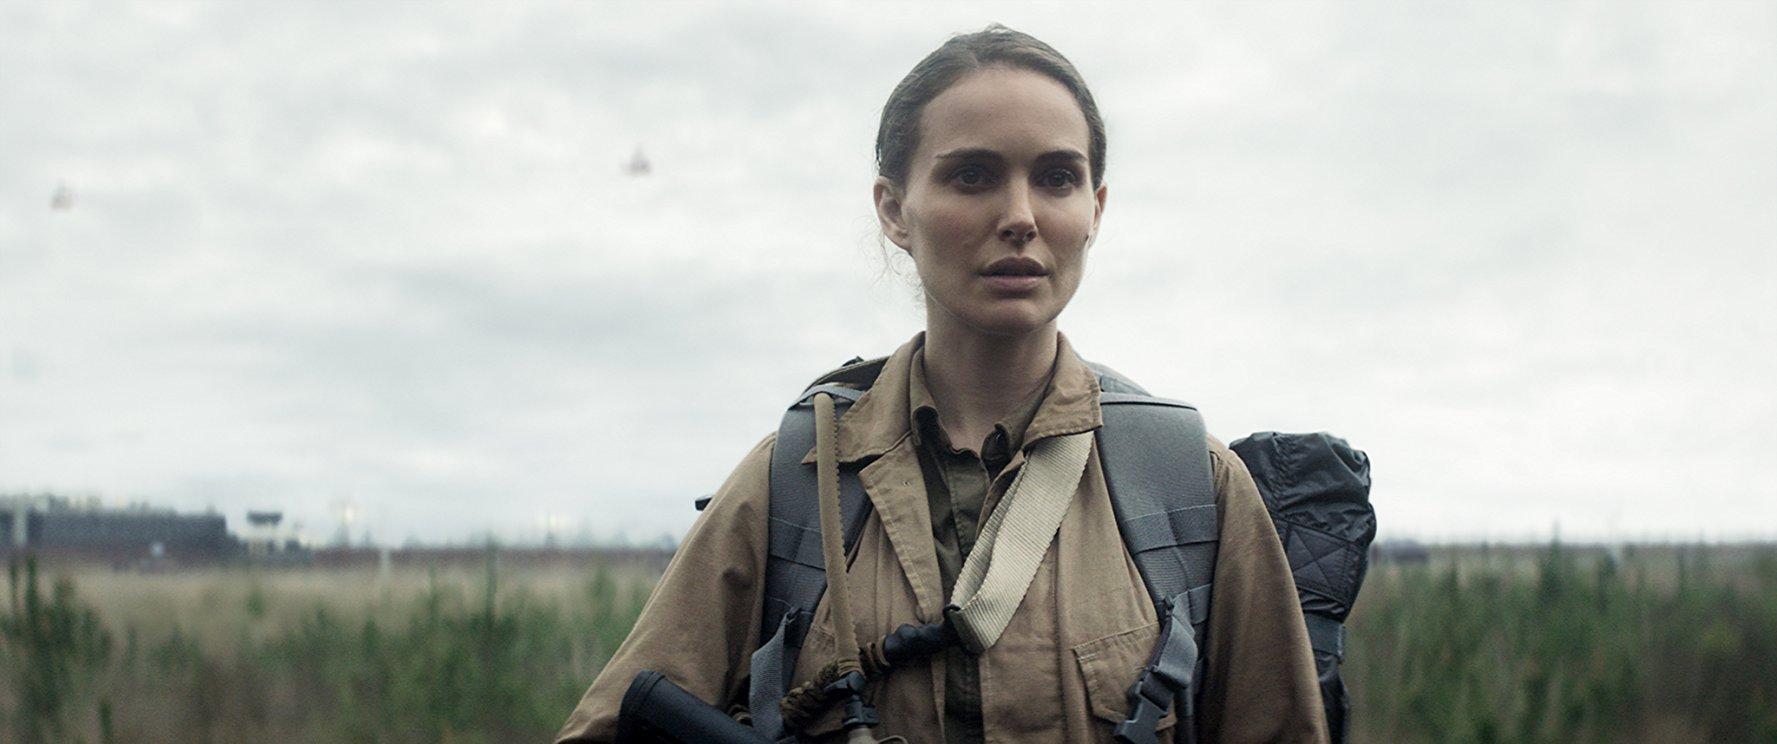 Iszonyú para lesz Natalie Portman új sci-fije